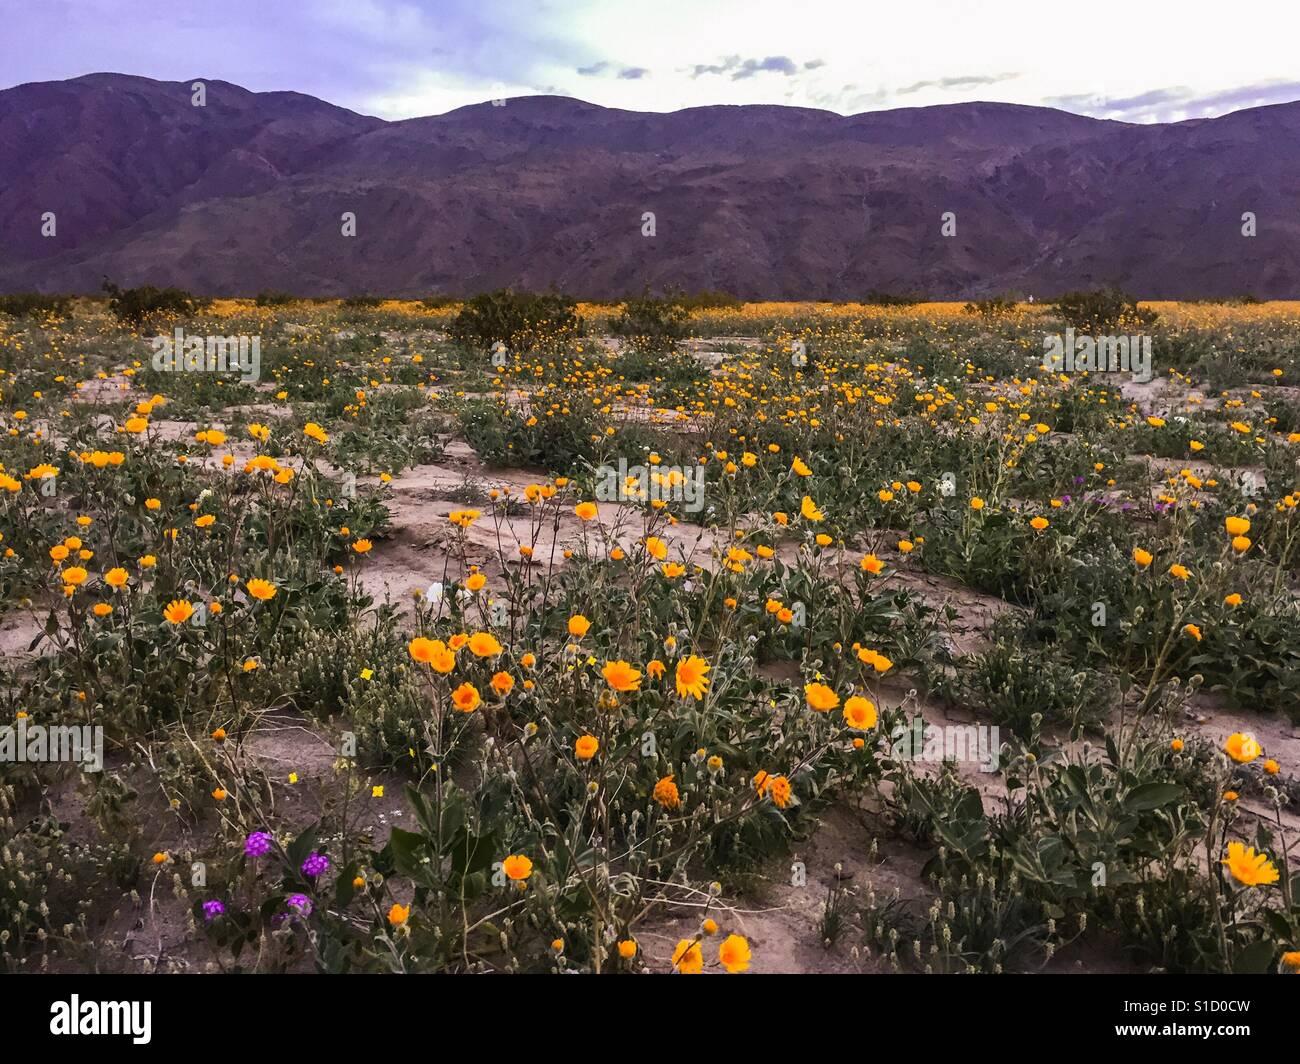 Desert flower bloom, Anza Borrego, CA - Stock Image